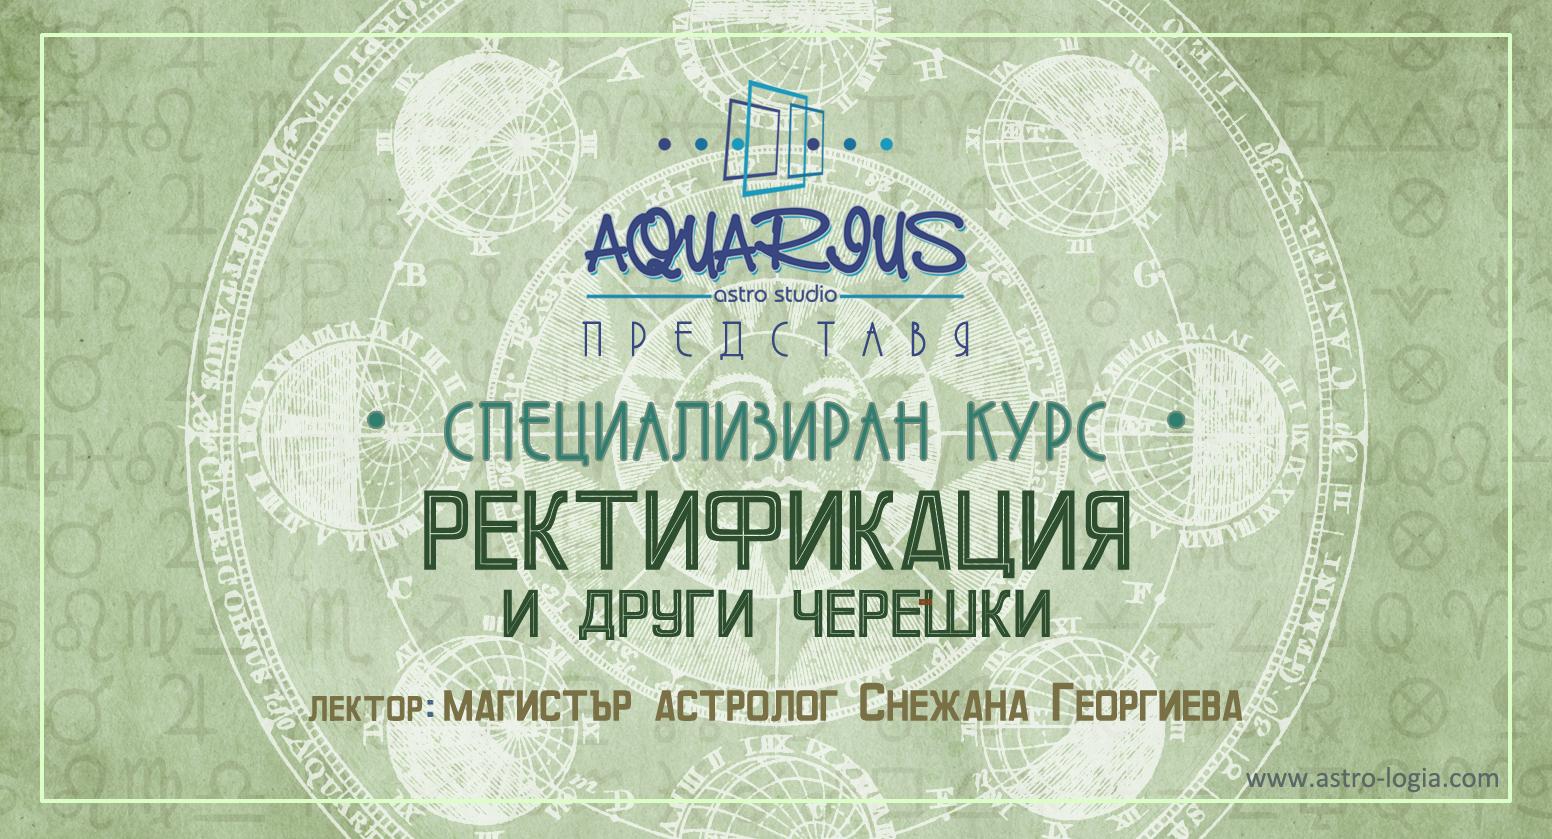 Kurs Rektifikaciq AstrologiaWEB